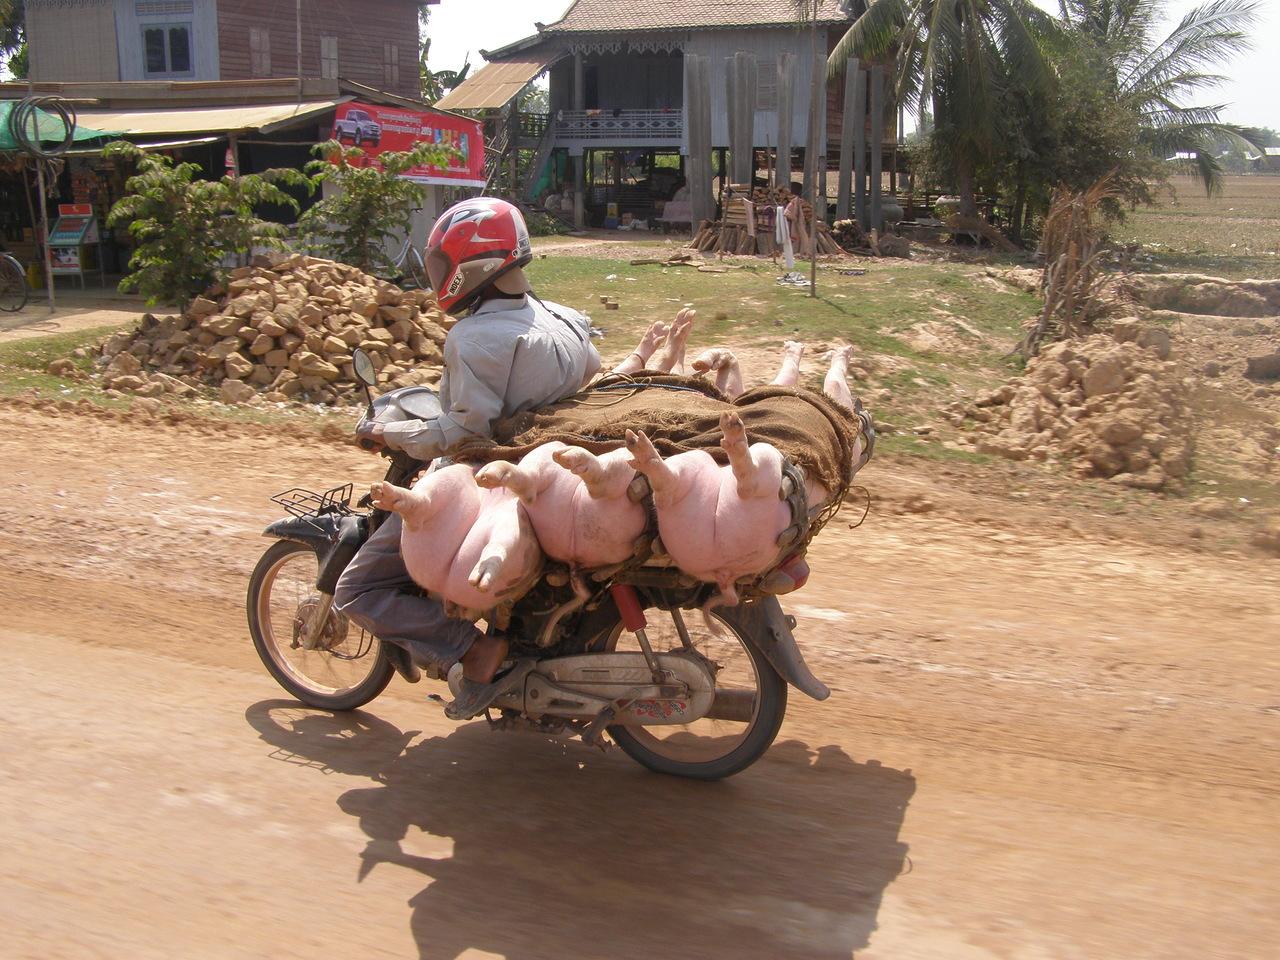 Камбоджа. Страна «Нарочно не придумаешь!»